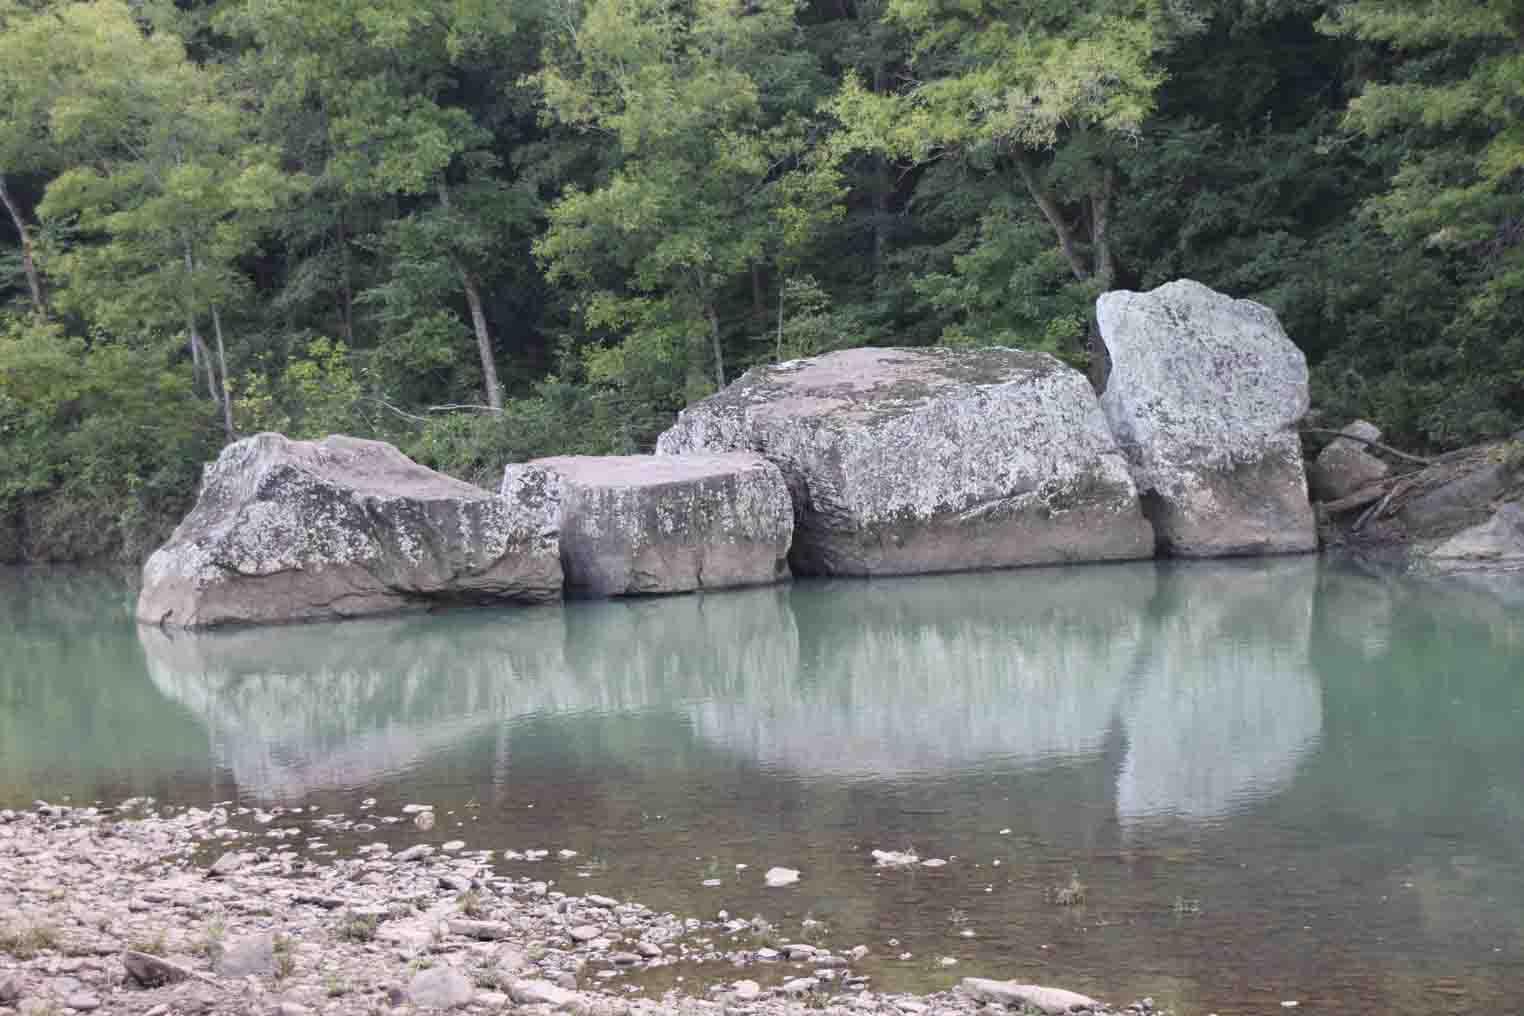 big piney creek, long pool recreation area, arkansas ozarks